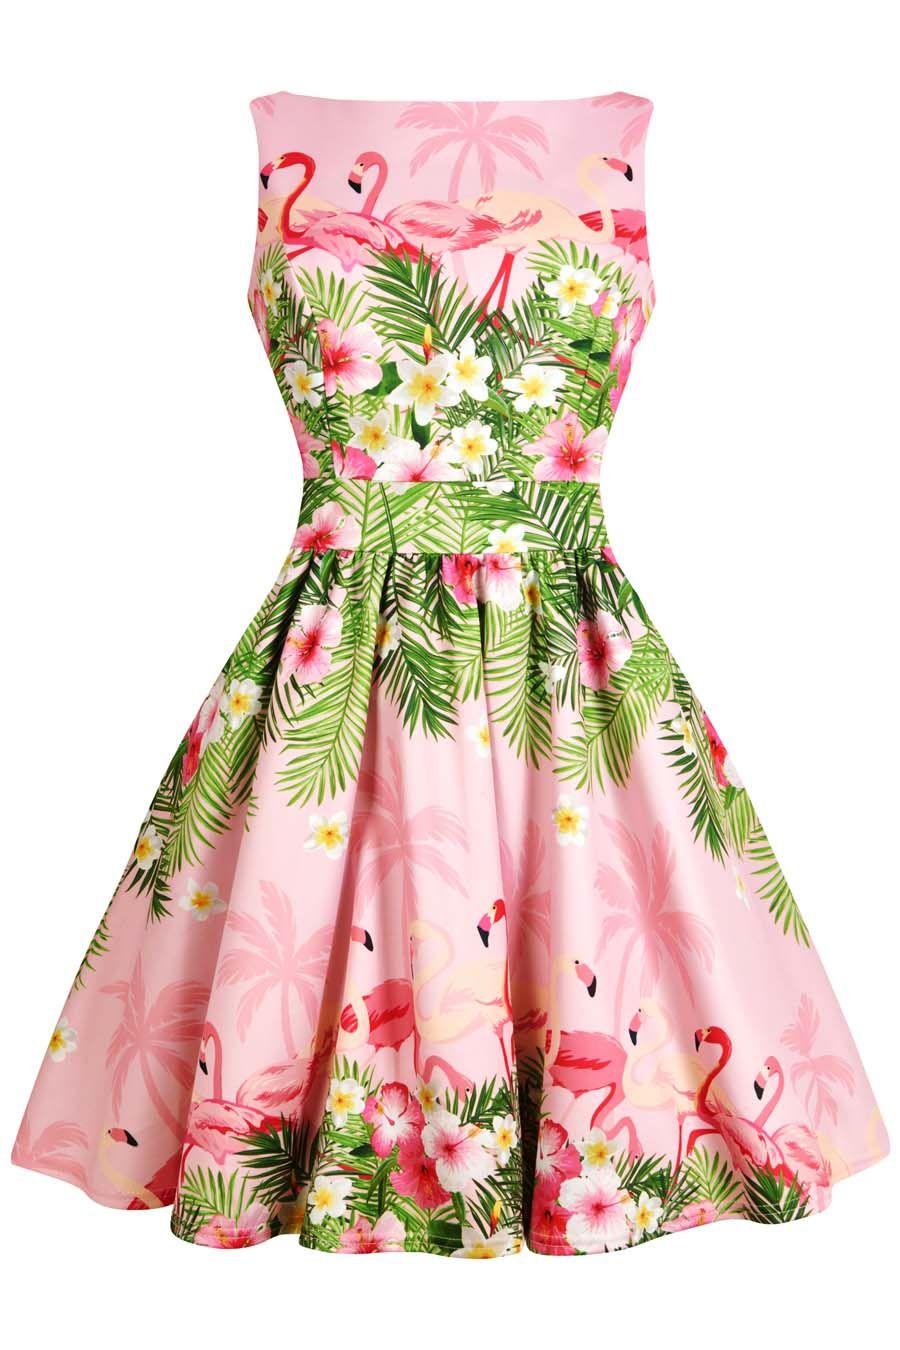 35cba69a28b Elsie sAttic - Pink Flamingo Border Print Tea Dress